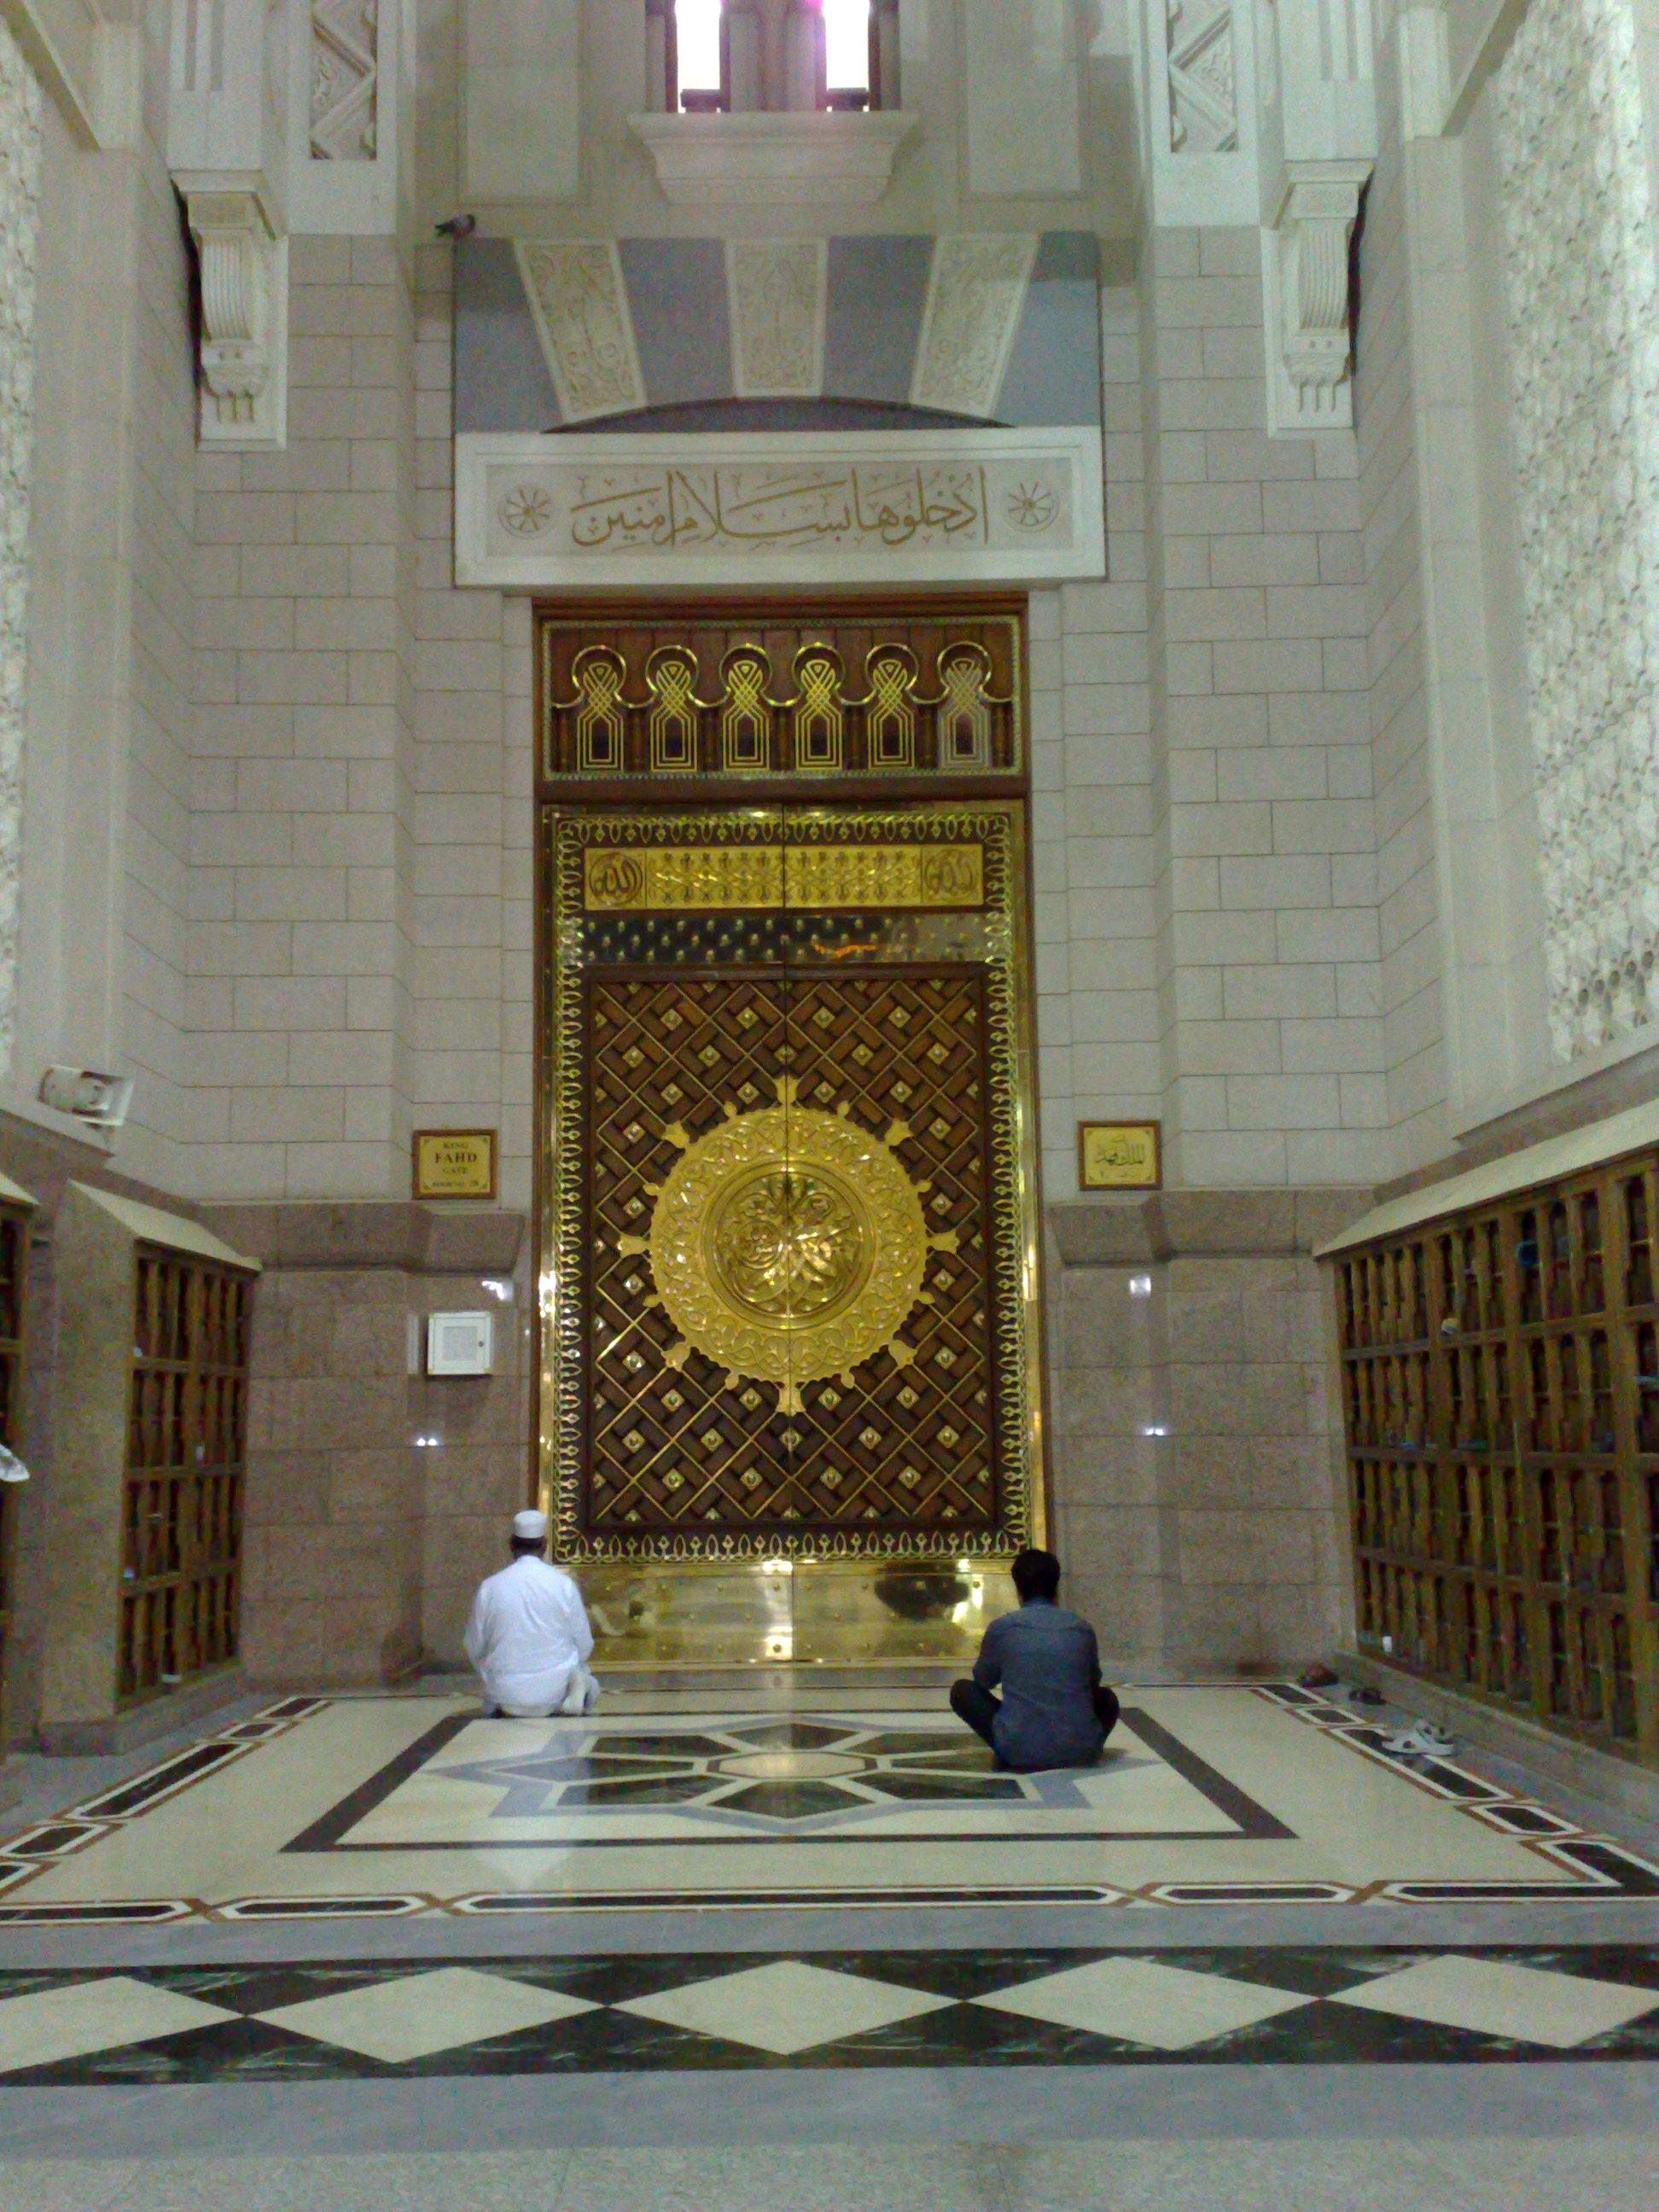 FileAl-Masjid al-Nabawi 04.jpg & File:Al-Masjid al-Nabawi 04.jpg - Wikimedia Commons